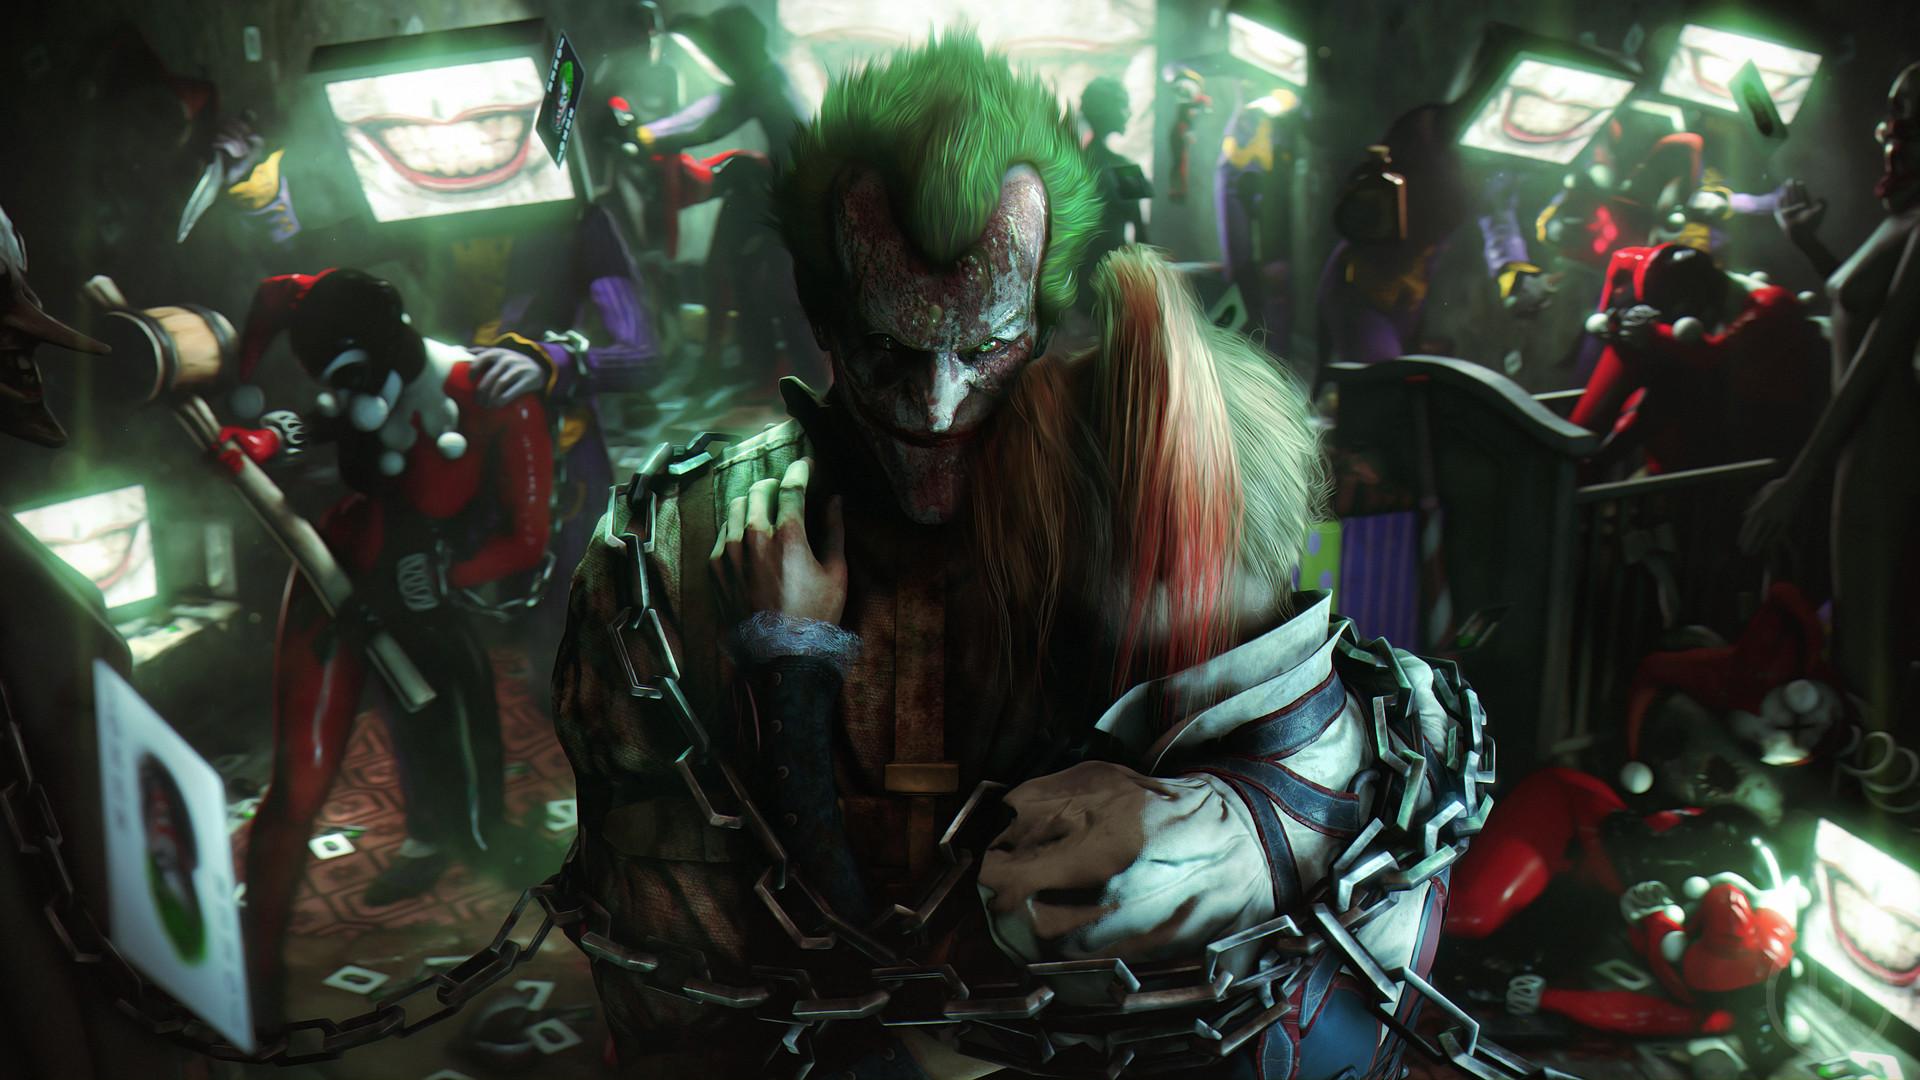 The-Joker-and-Harley-Quinn-Wallpaper-by-hectorolguin434